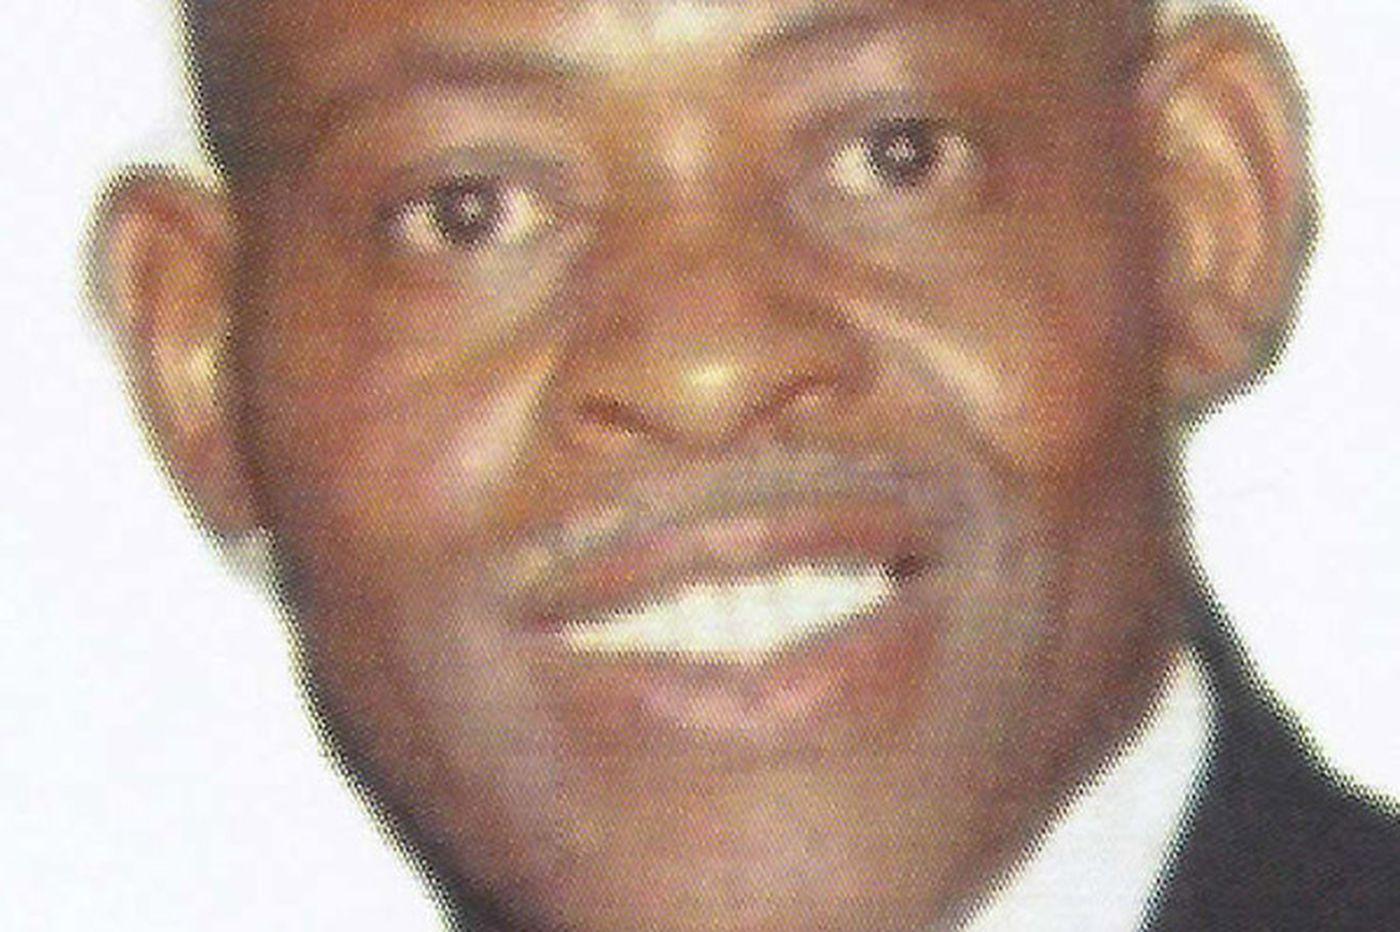 Leonard Brinkley Sr., 66, Graterford Prison corrections officer and University of Delaware maintenance supervisor